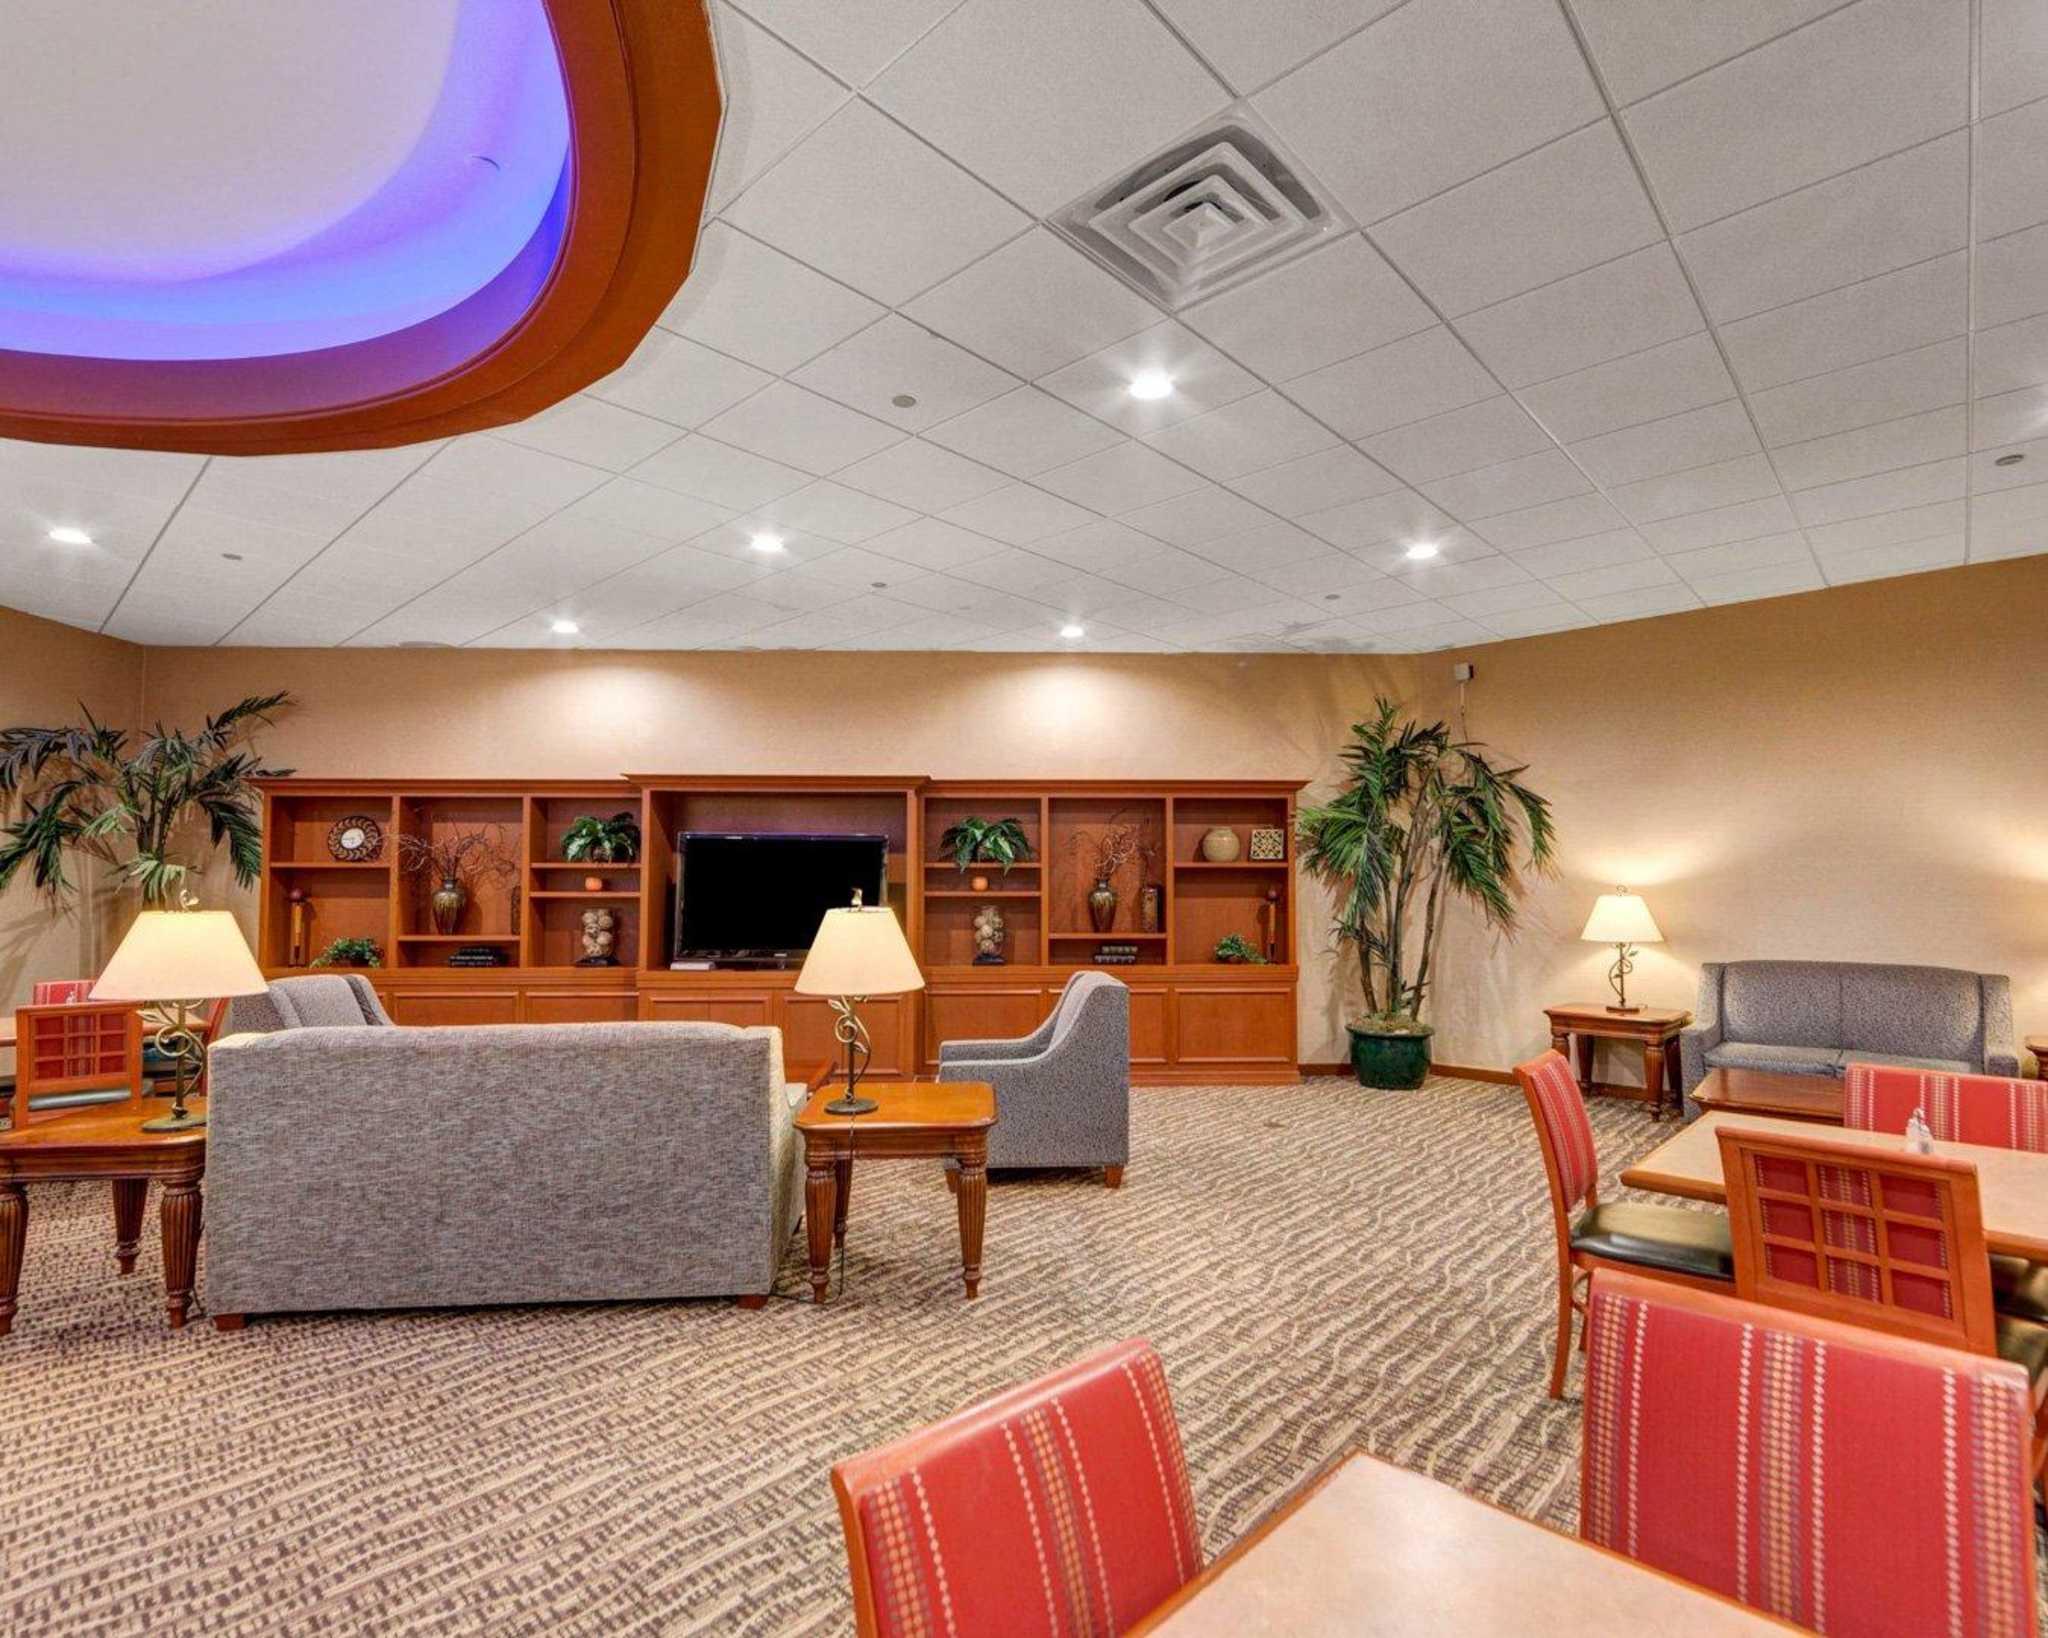 Comfort Inn & Suites Plano East image 16